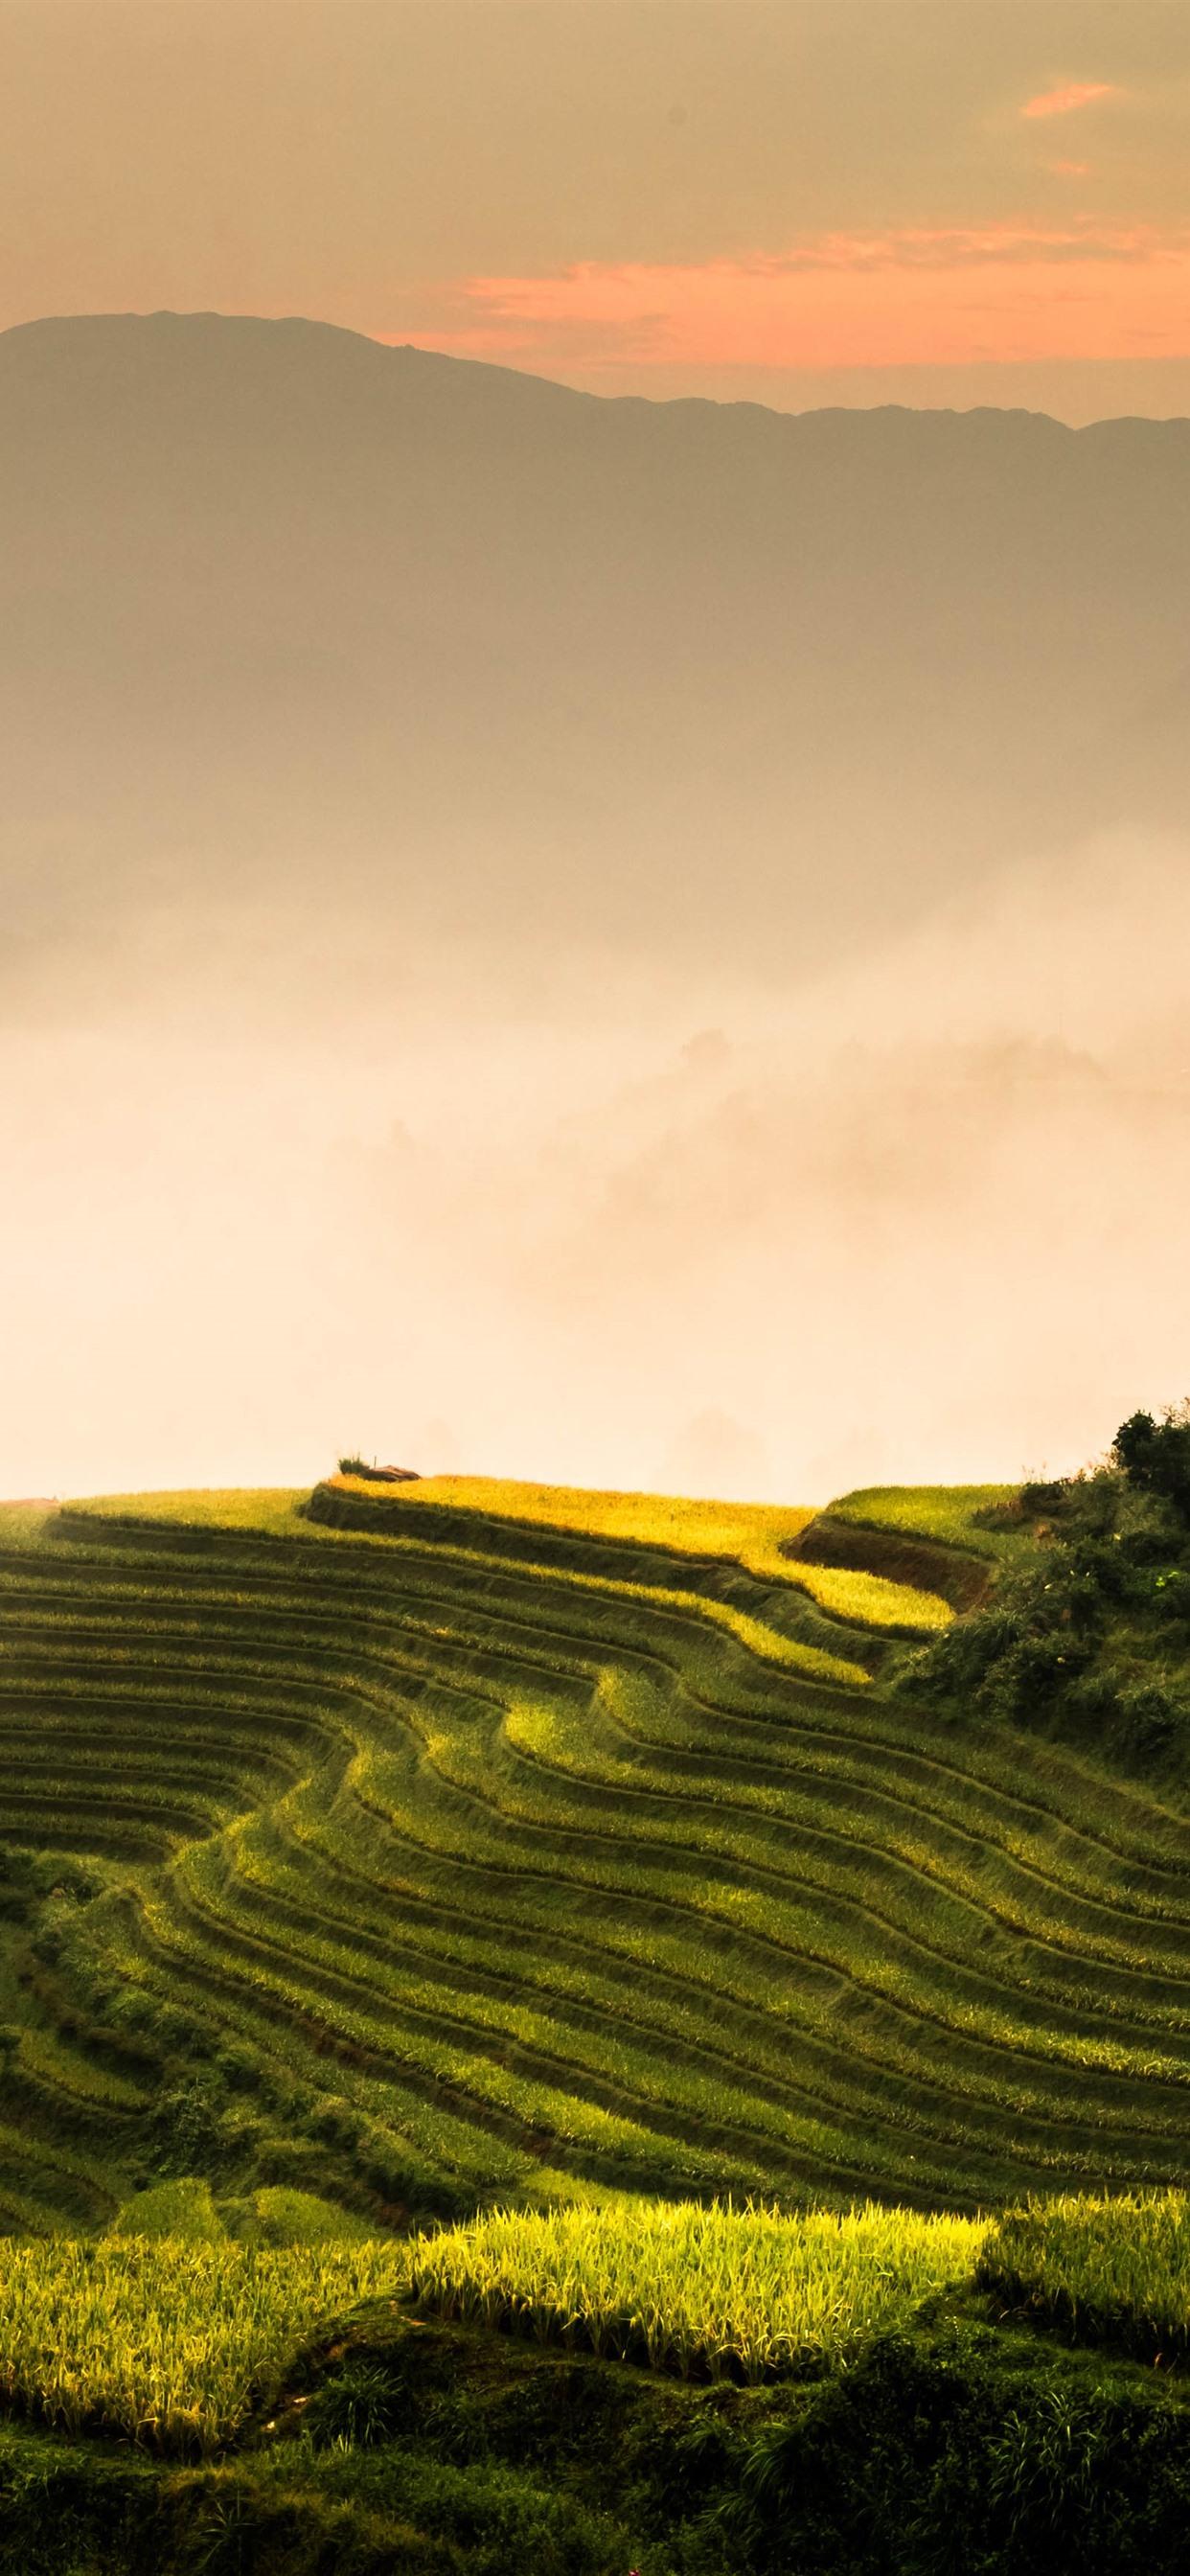 Longji Rice Terraces Morning Fog Mountains Guilin China